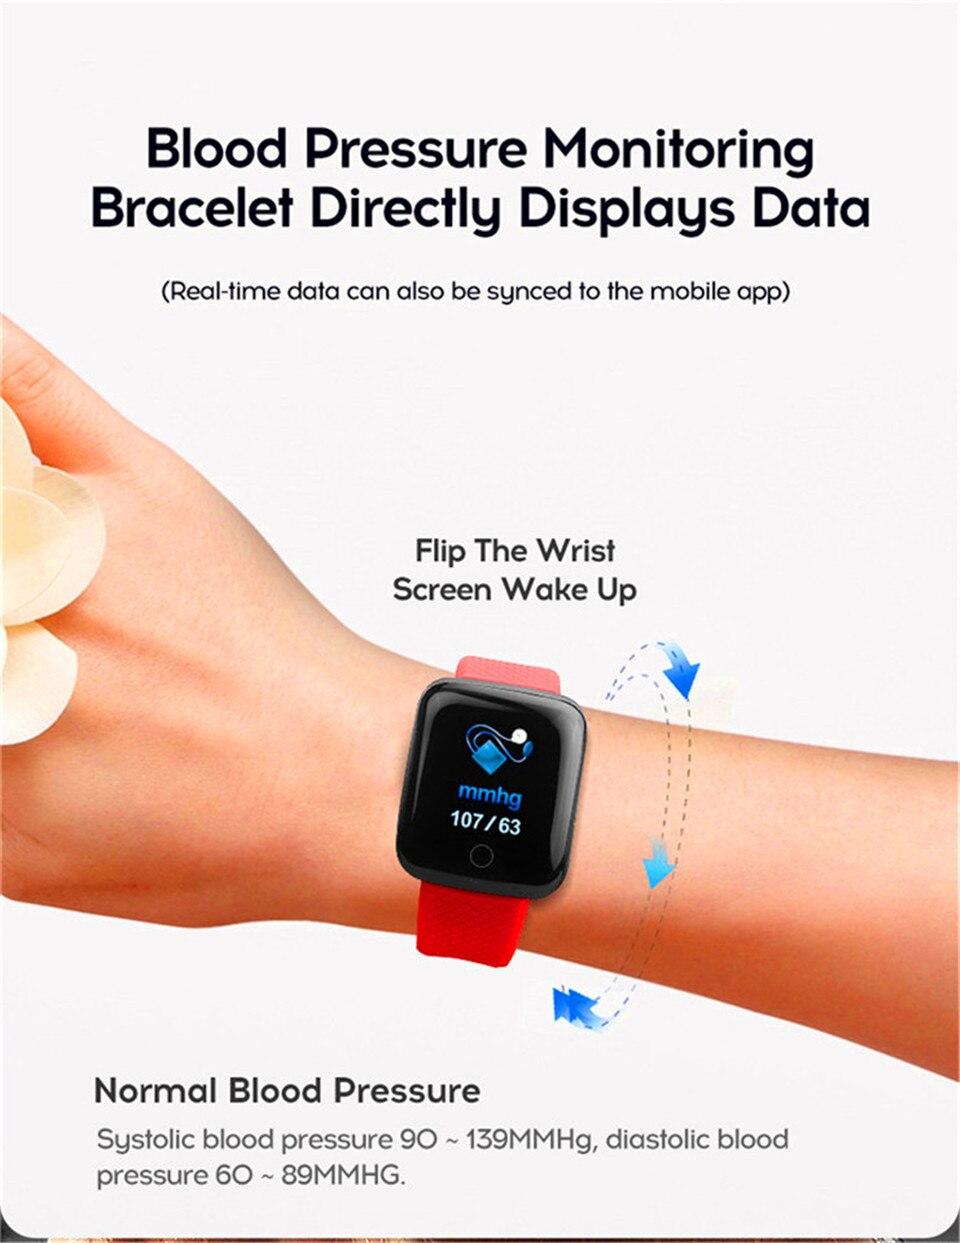 HTB1zWYoO4TpK1RjSZR0q6zEwXXaG Smart Wristband Heart Rate Monitor Smart Fitness Bracelet Blood Pressure Waterproof IP67 Fitness Tracker Watch For Women Men